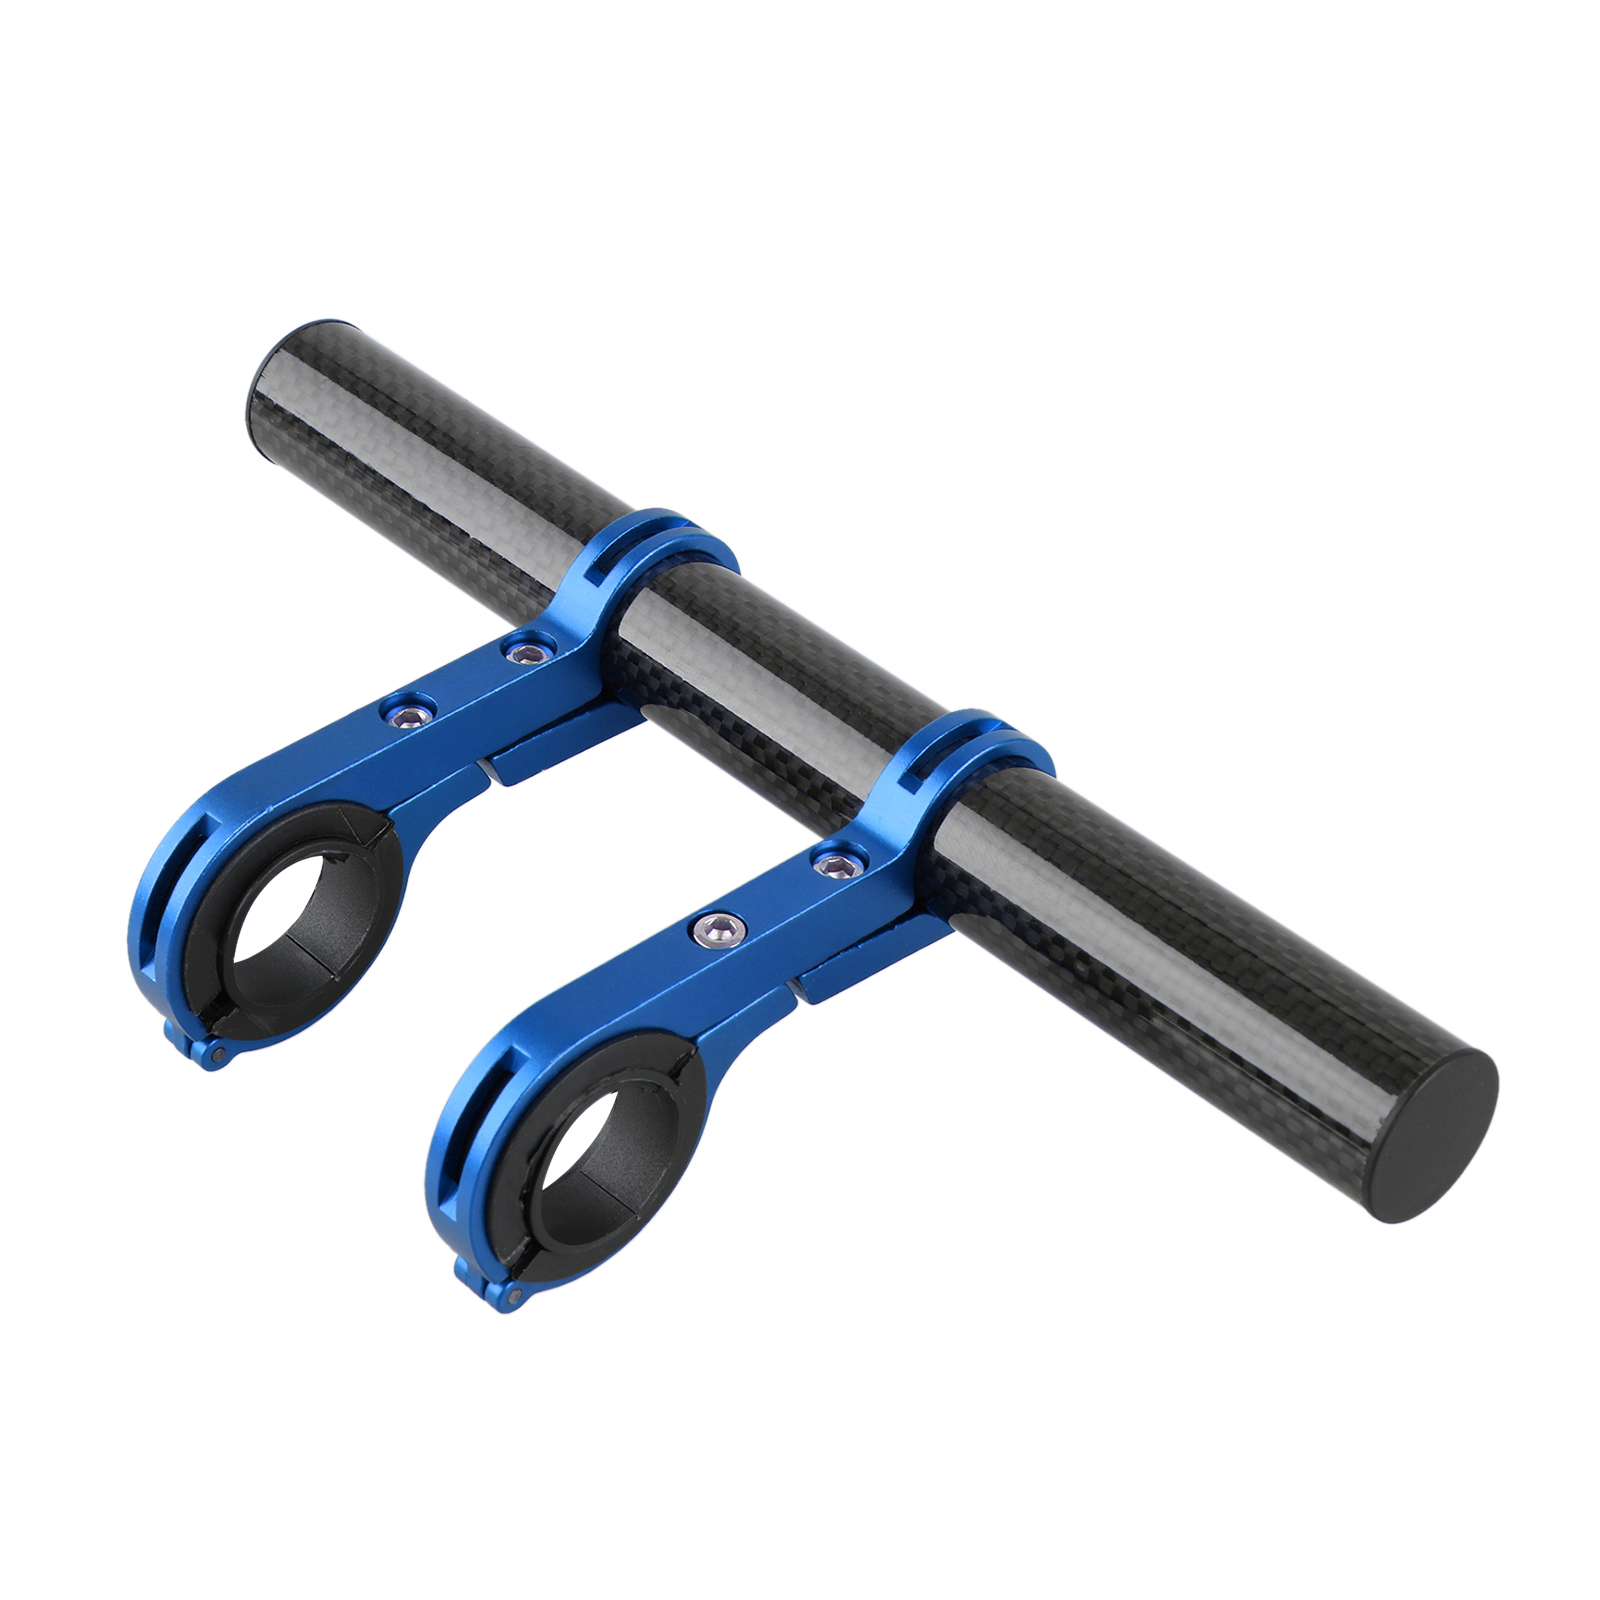 Bicycle Accessories Bike Bracket Handlebar Extension Flashlight Mount Carbon Fiber Extender Aluminum Alloy Holder Space Saver